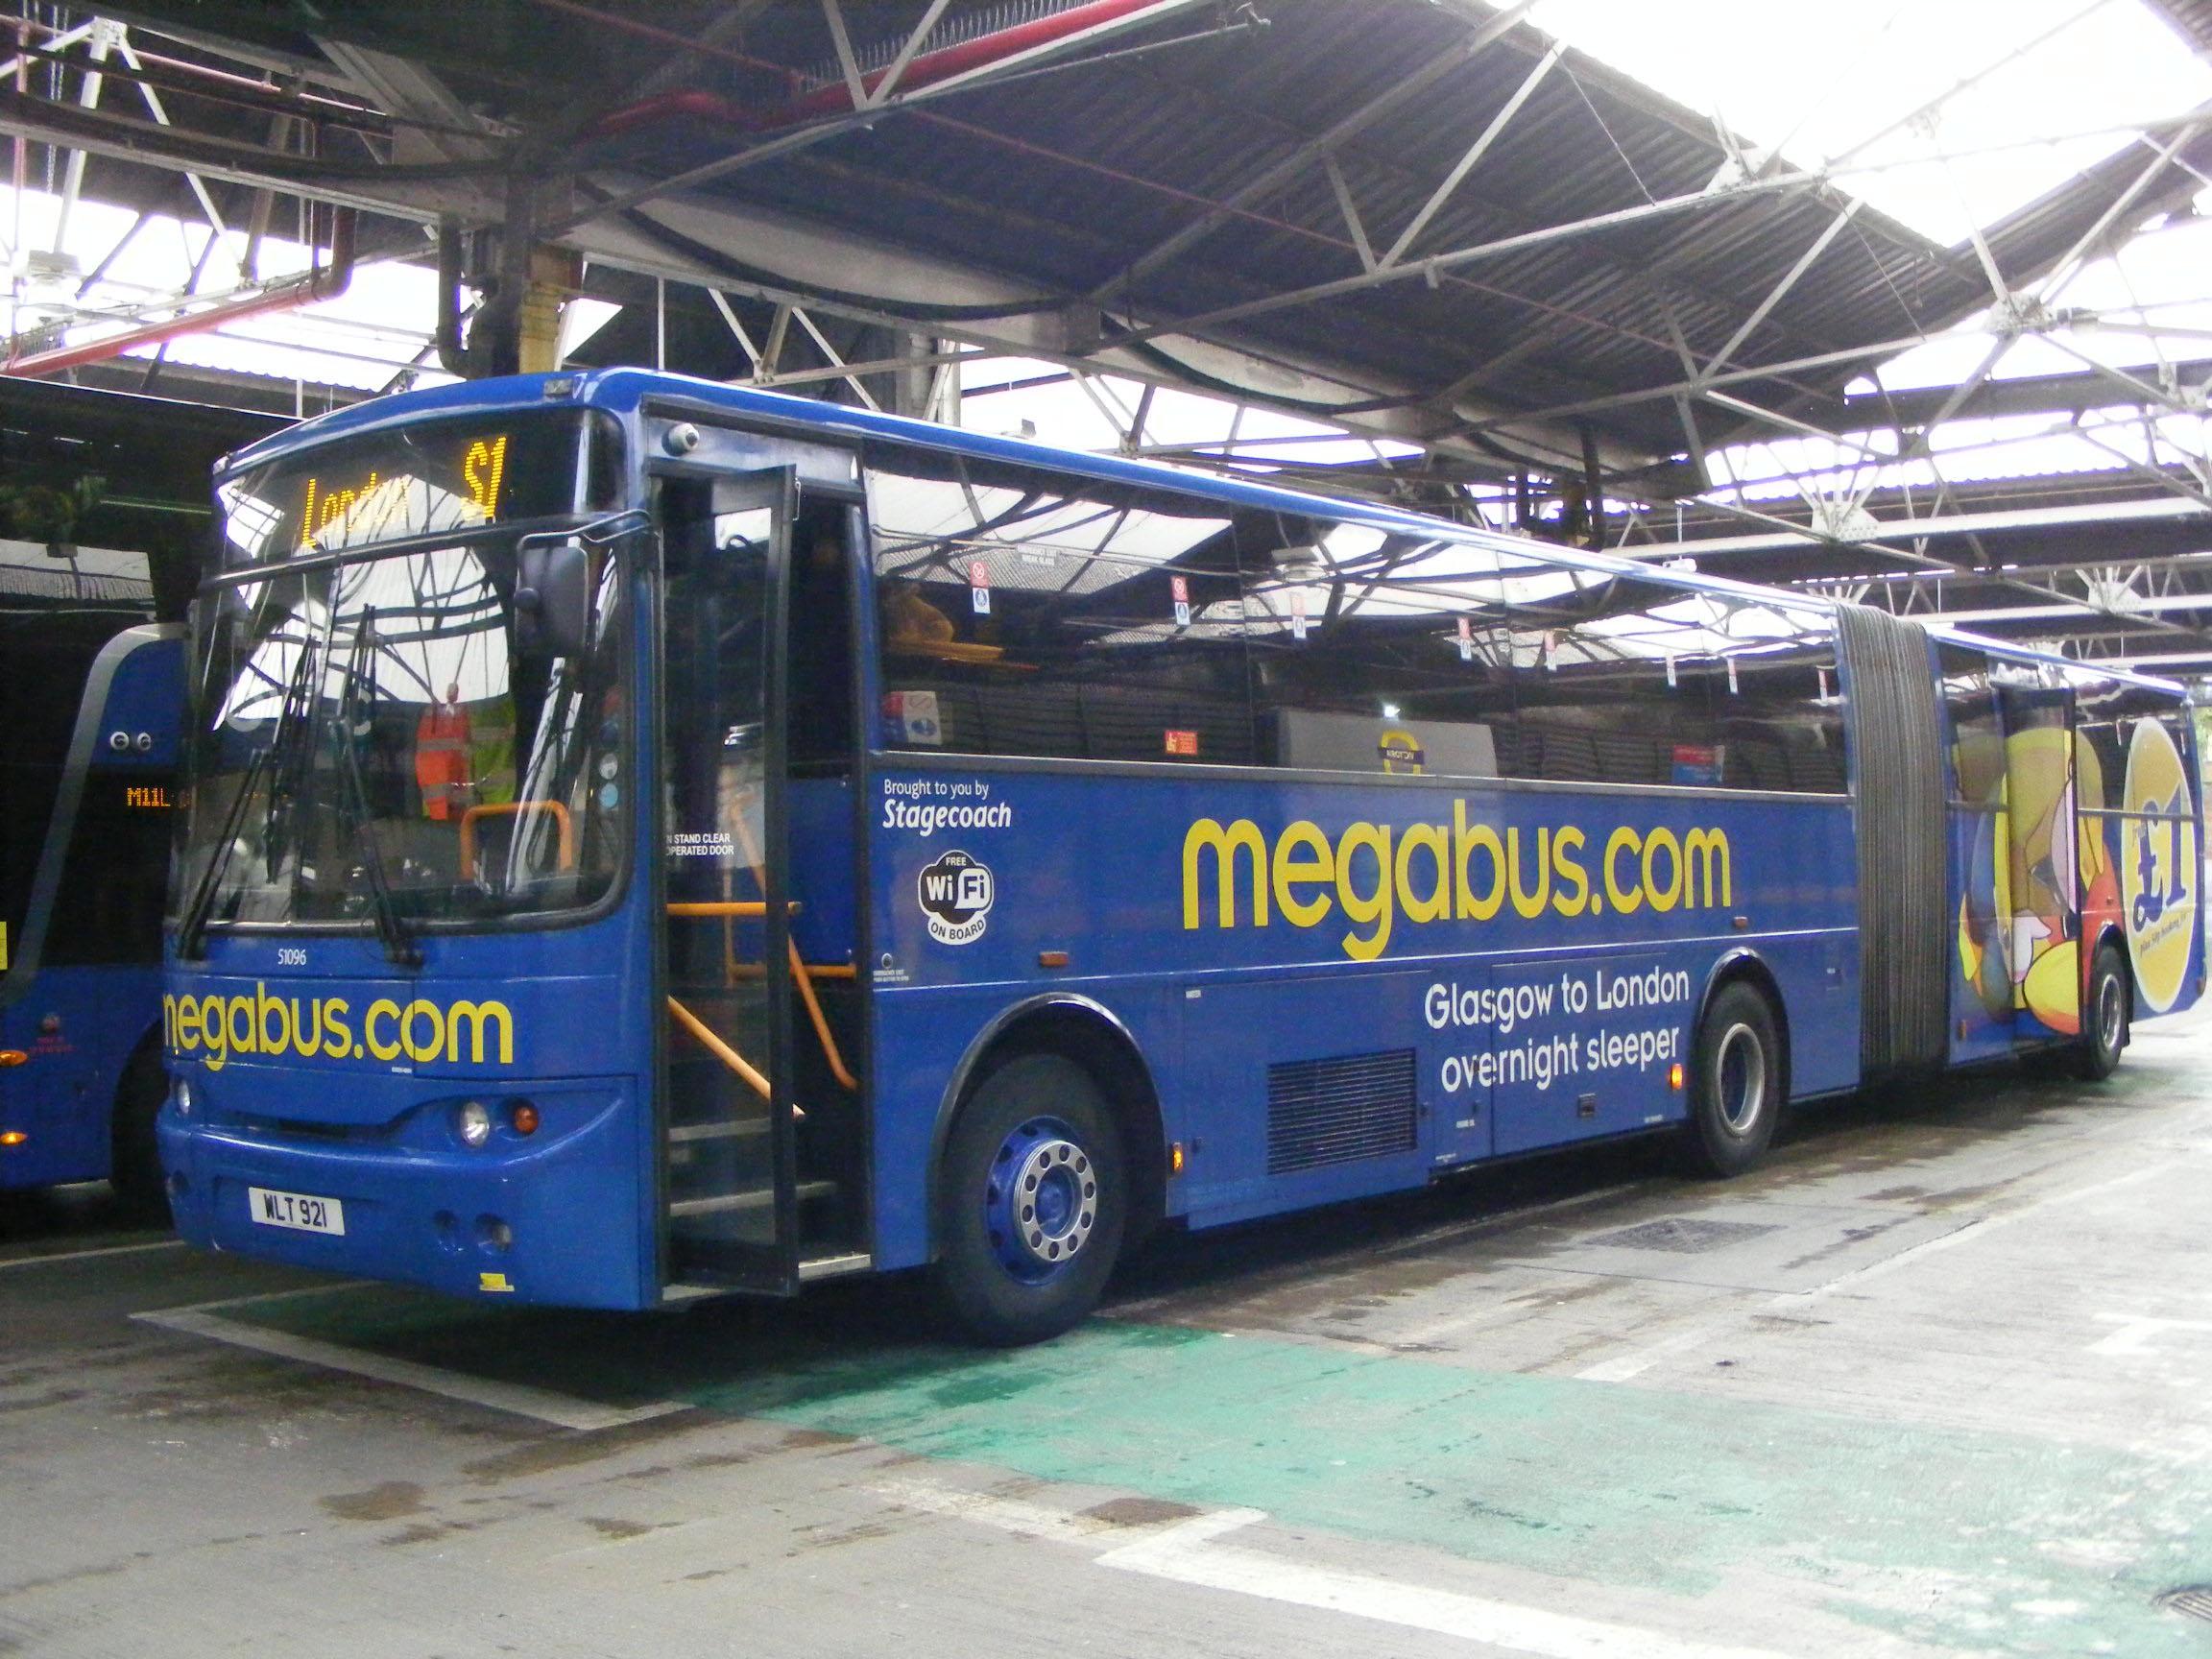 Megabus Uk Showbus Bus Image Gallery